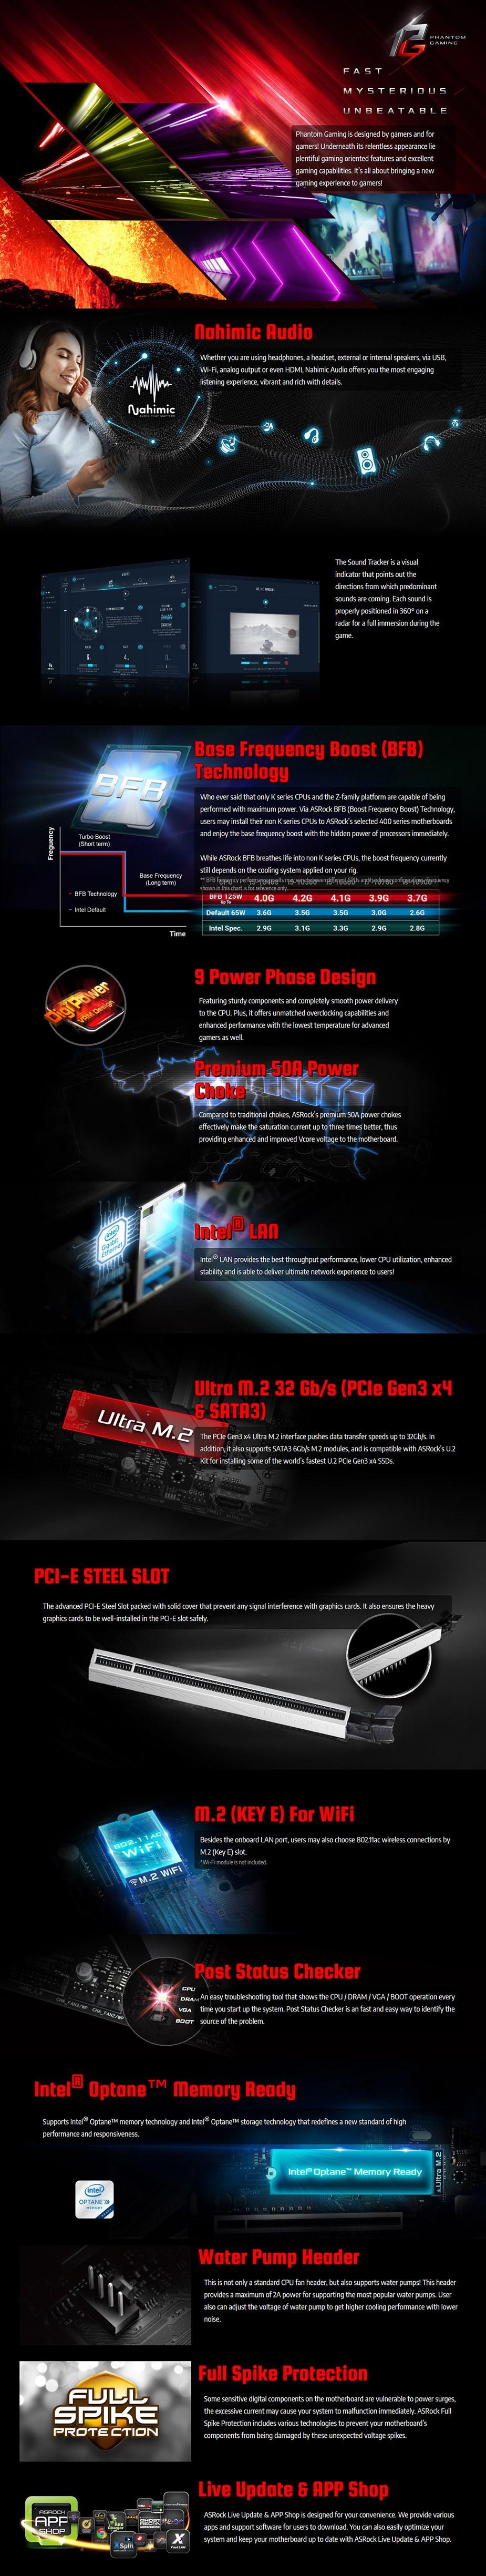 ASRock B460 Phantom Gaming 4 LGA 1200 ATX Motherboard - Overview 1